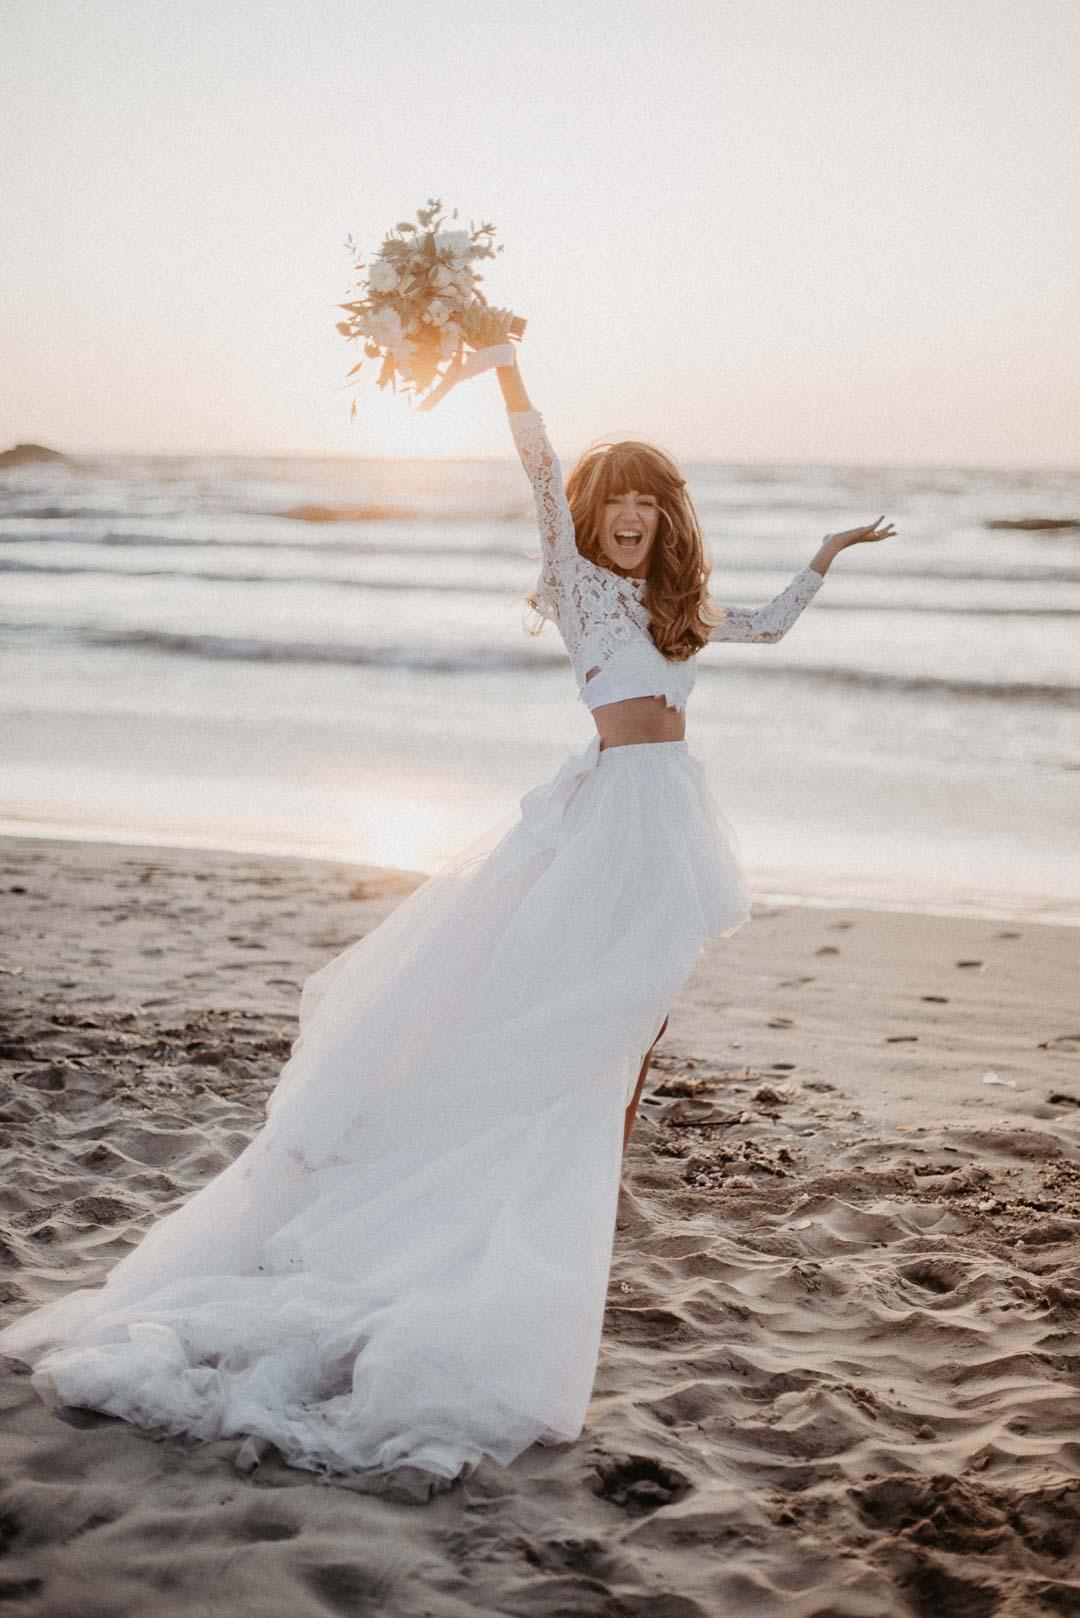 wedding-photographer-destination-fineart-bespoke-reportage-napoli-nabilah-vivianeizzo-spazio46-129